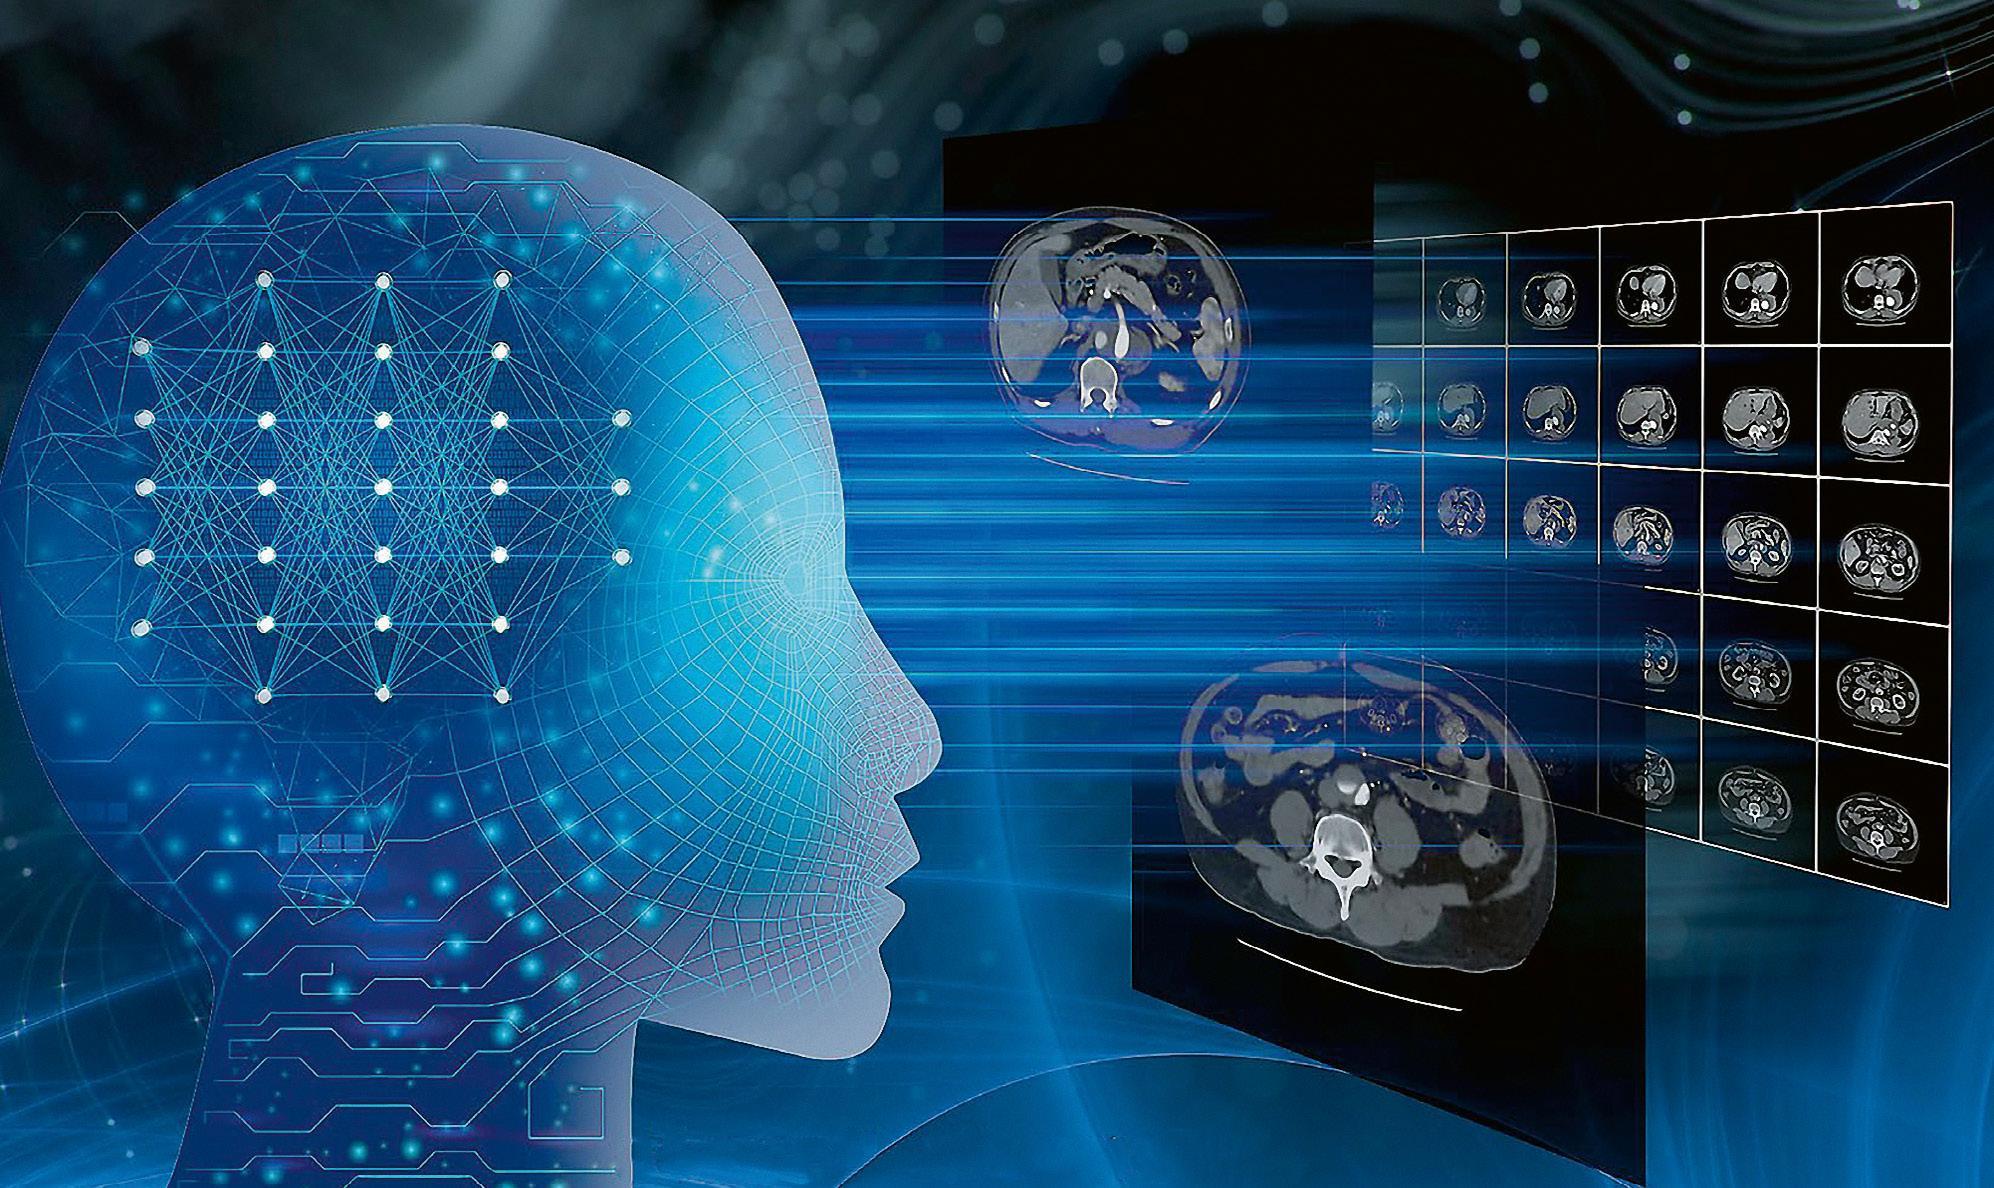 Page 38 of CT-Rekonstruktionstechnologie mit KI und Deep Learning